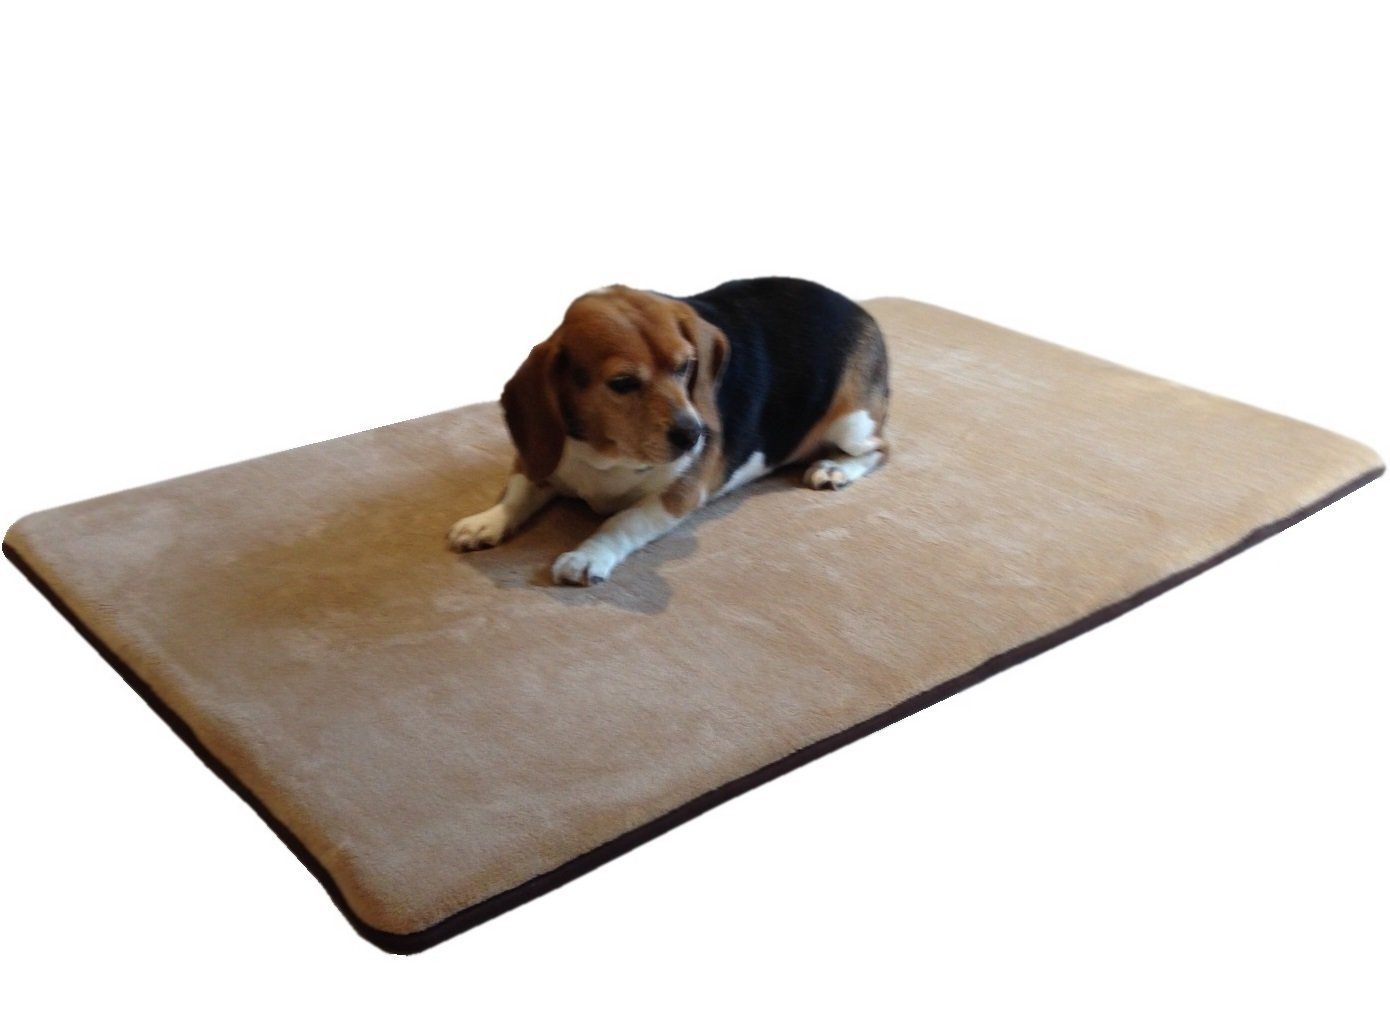 dog mats sponge store pet pad shape creative comfortable toast pets bread cushion mat soft product cat